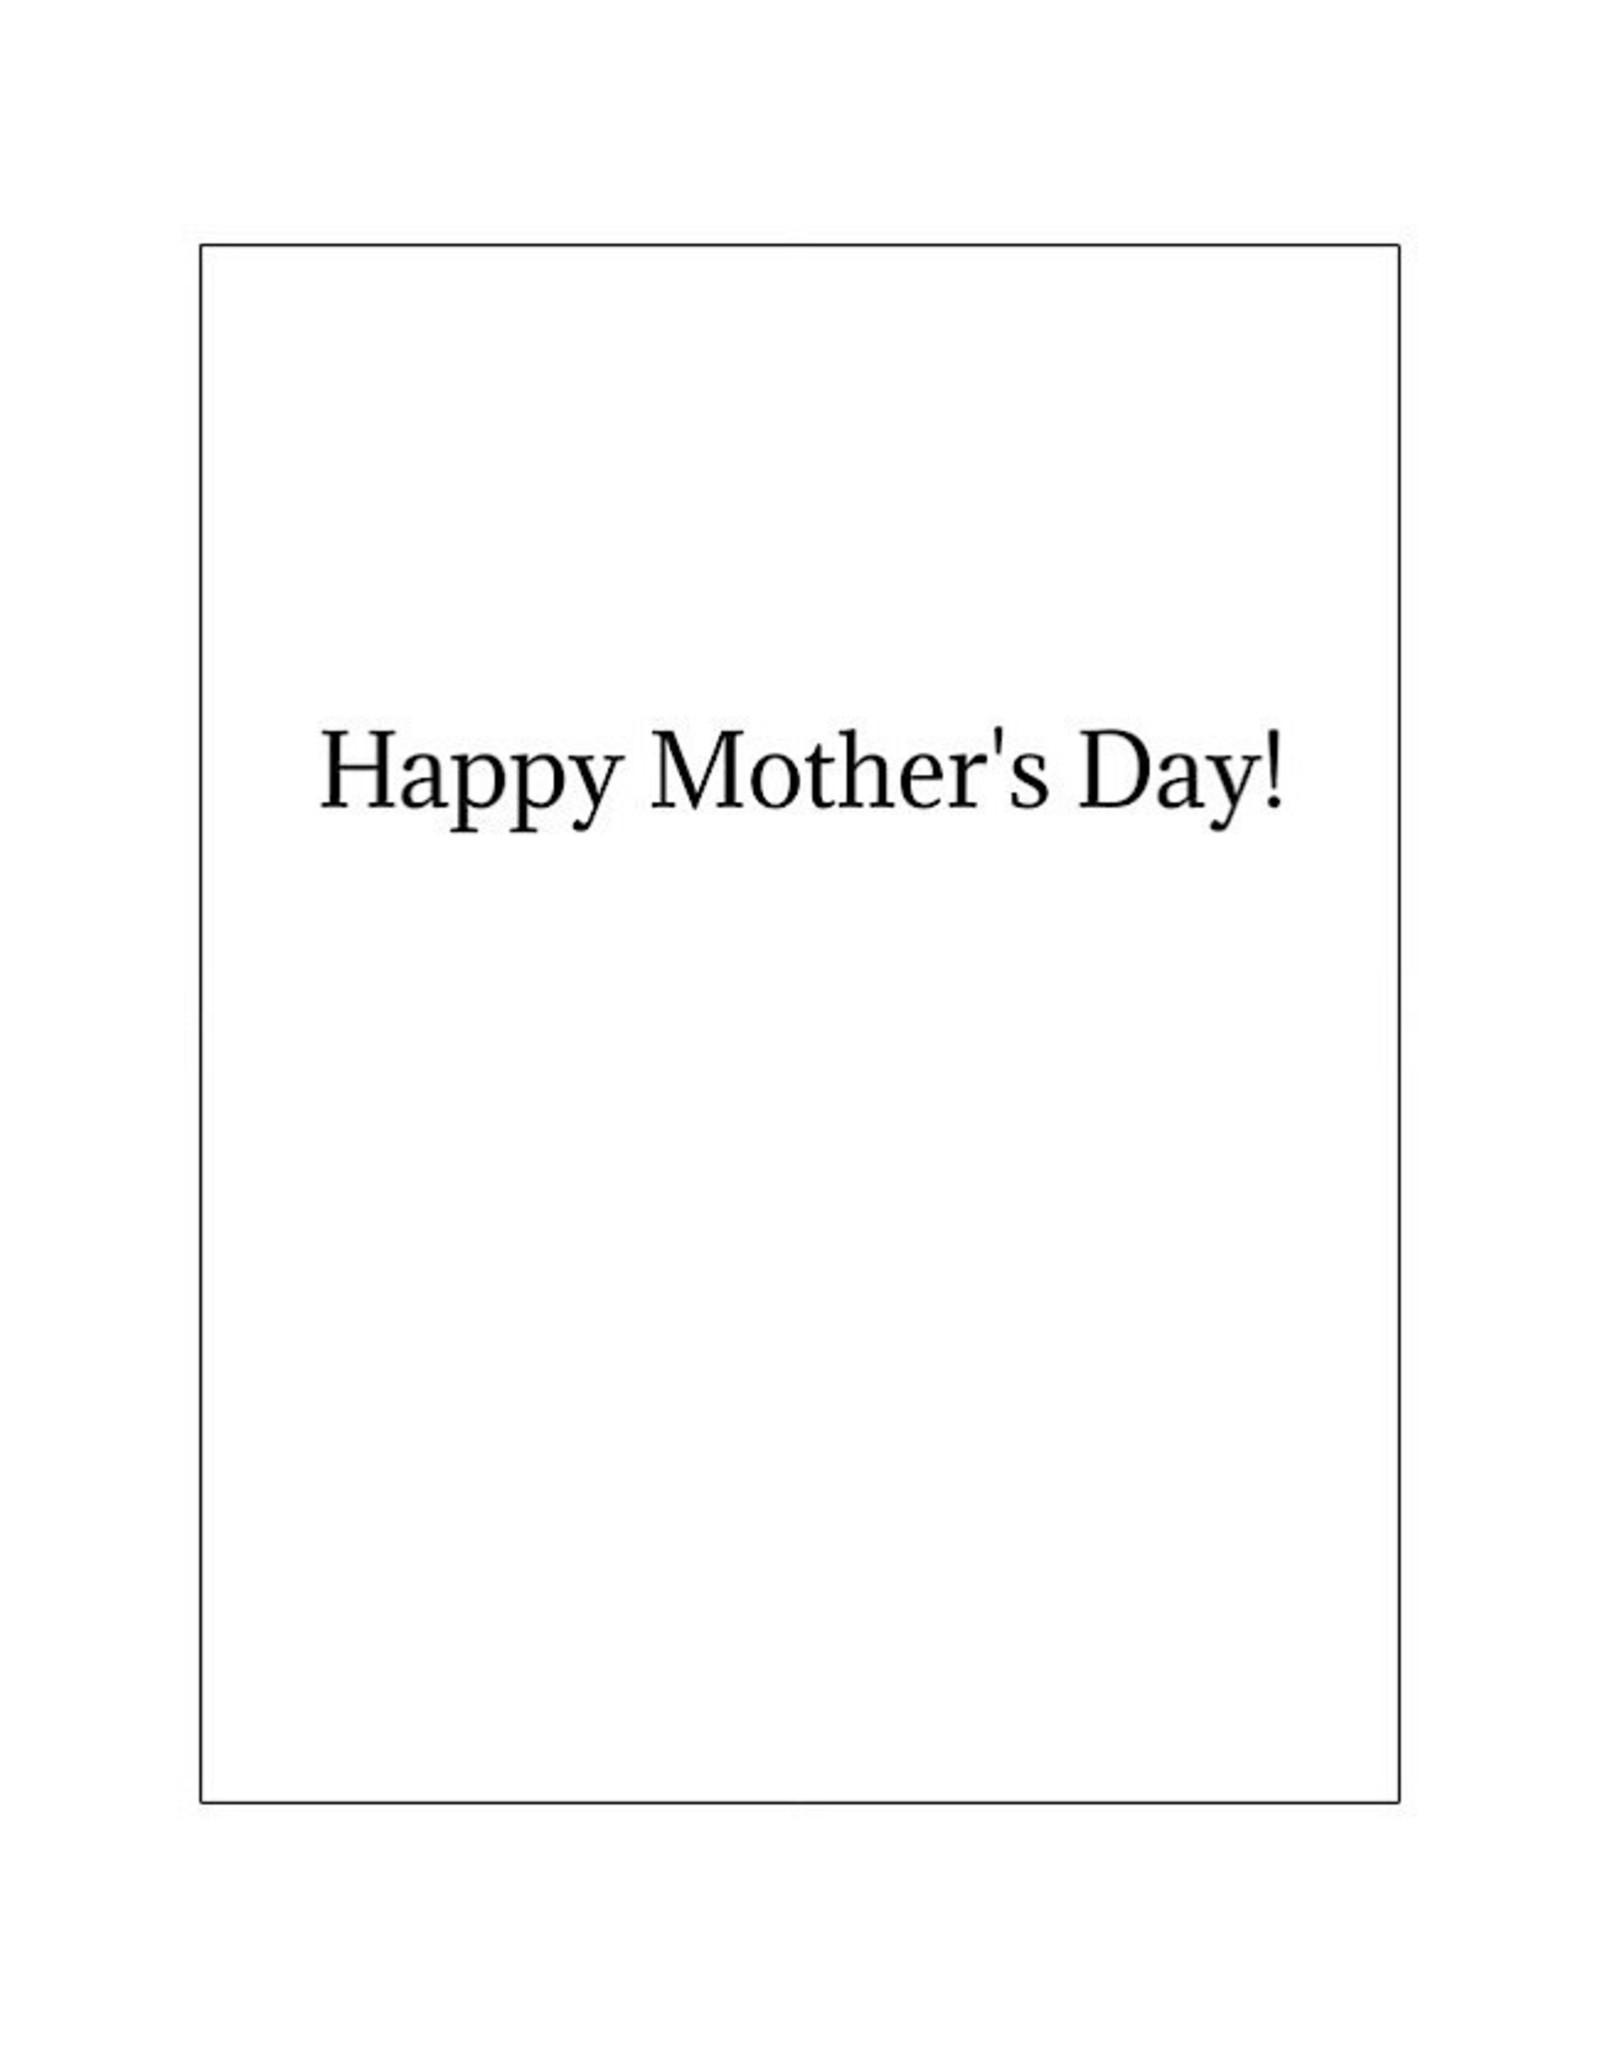 Card #MD02 - Dear Mom, Please Accept This Card In Lieu Of Grandchildren